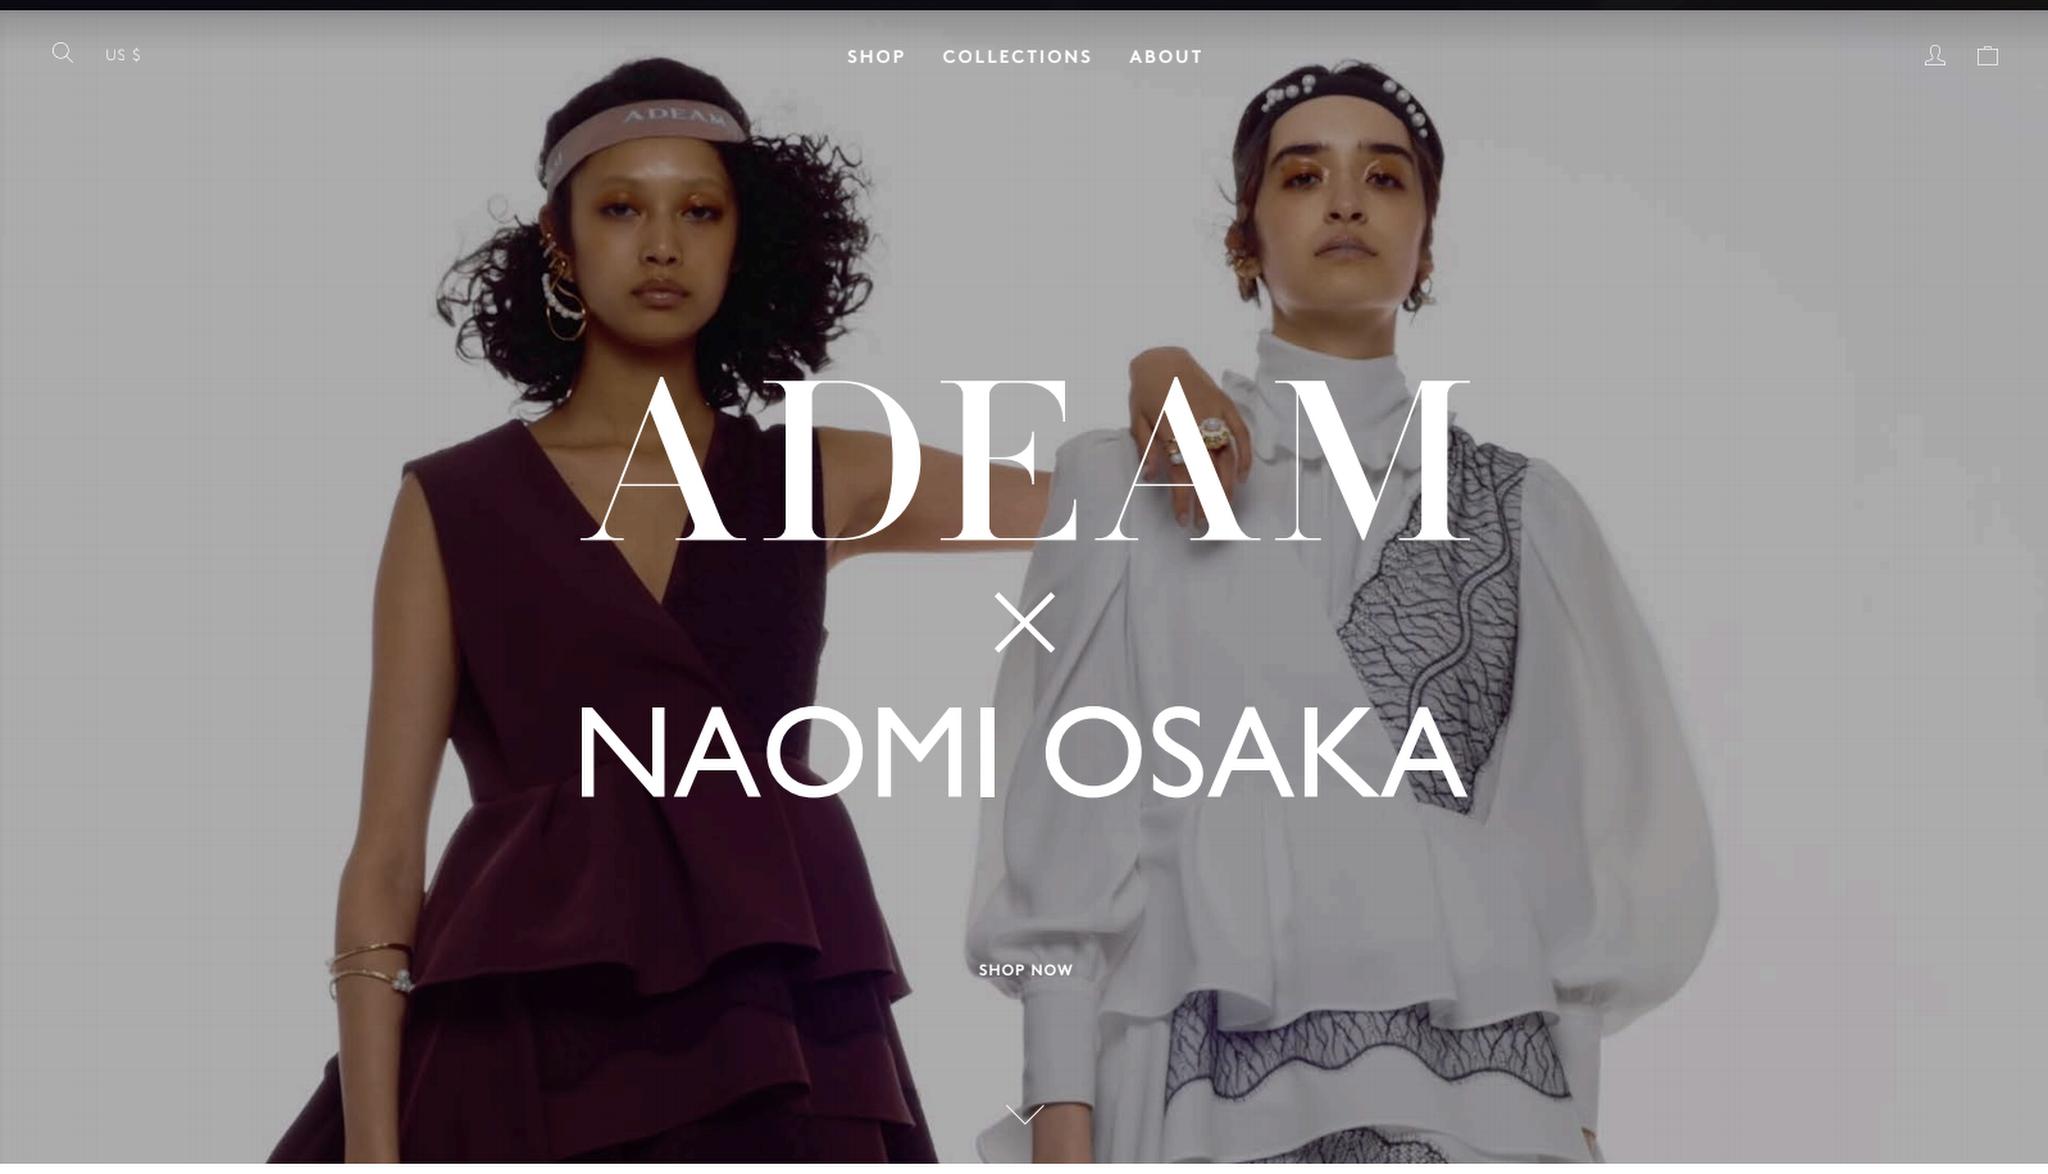 A screenshot from the Adeam x Noami Osaka e-commerce website.